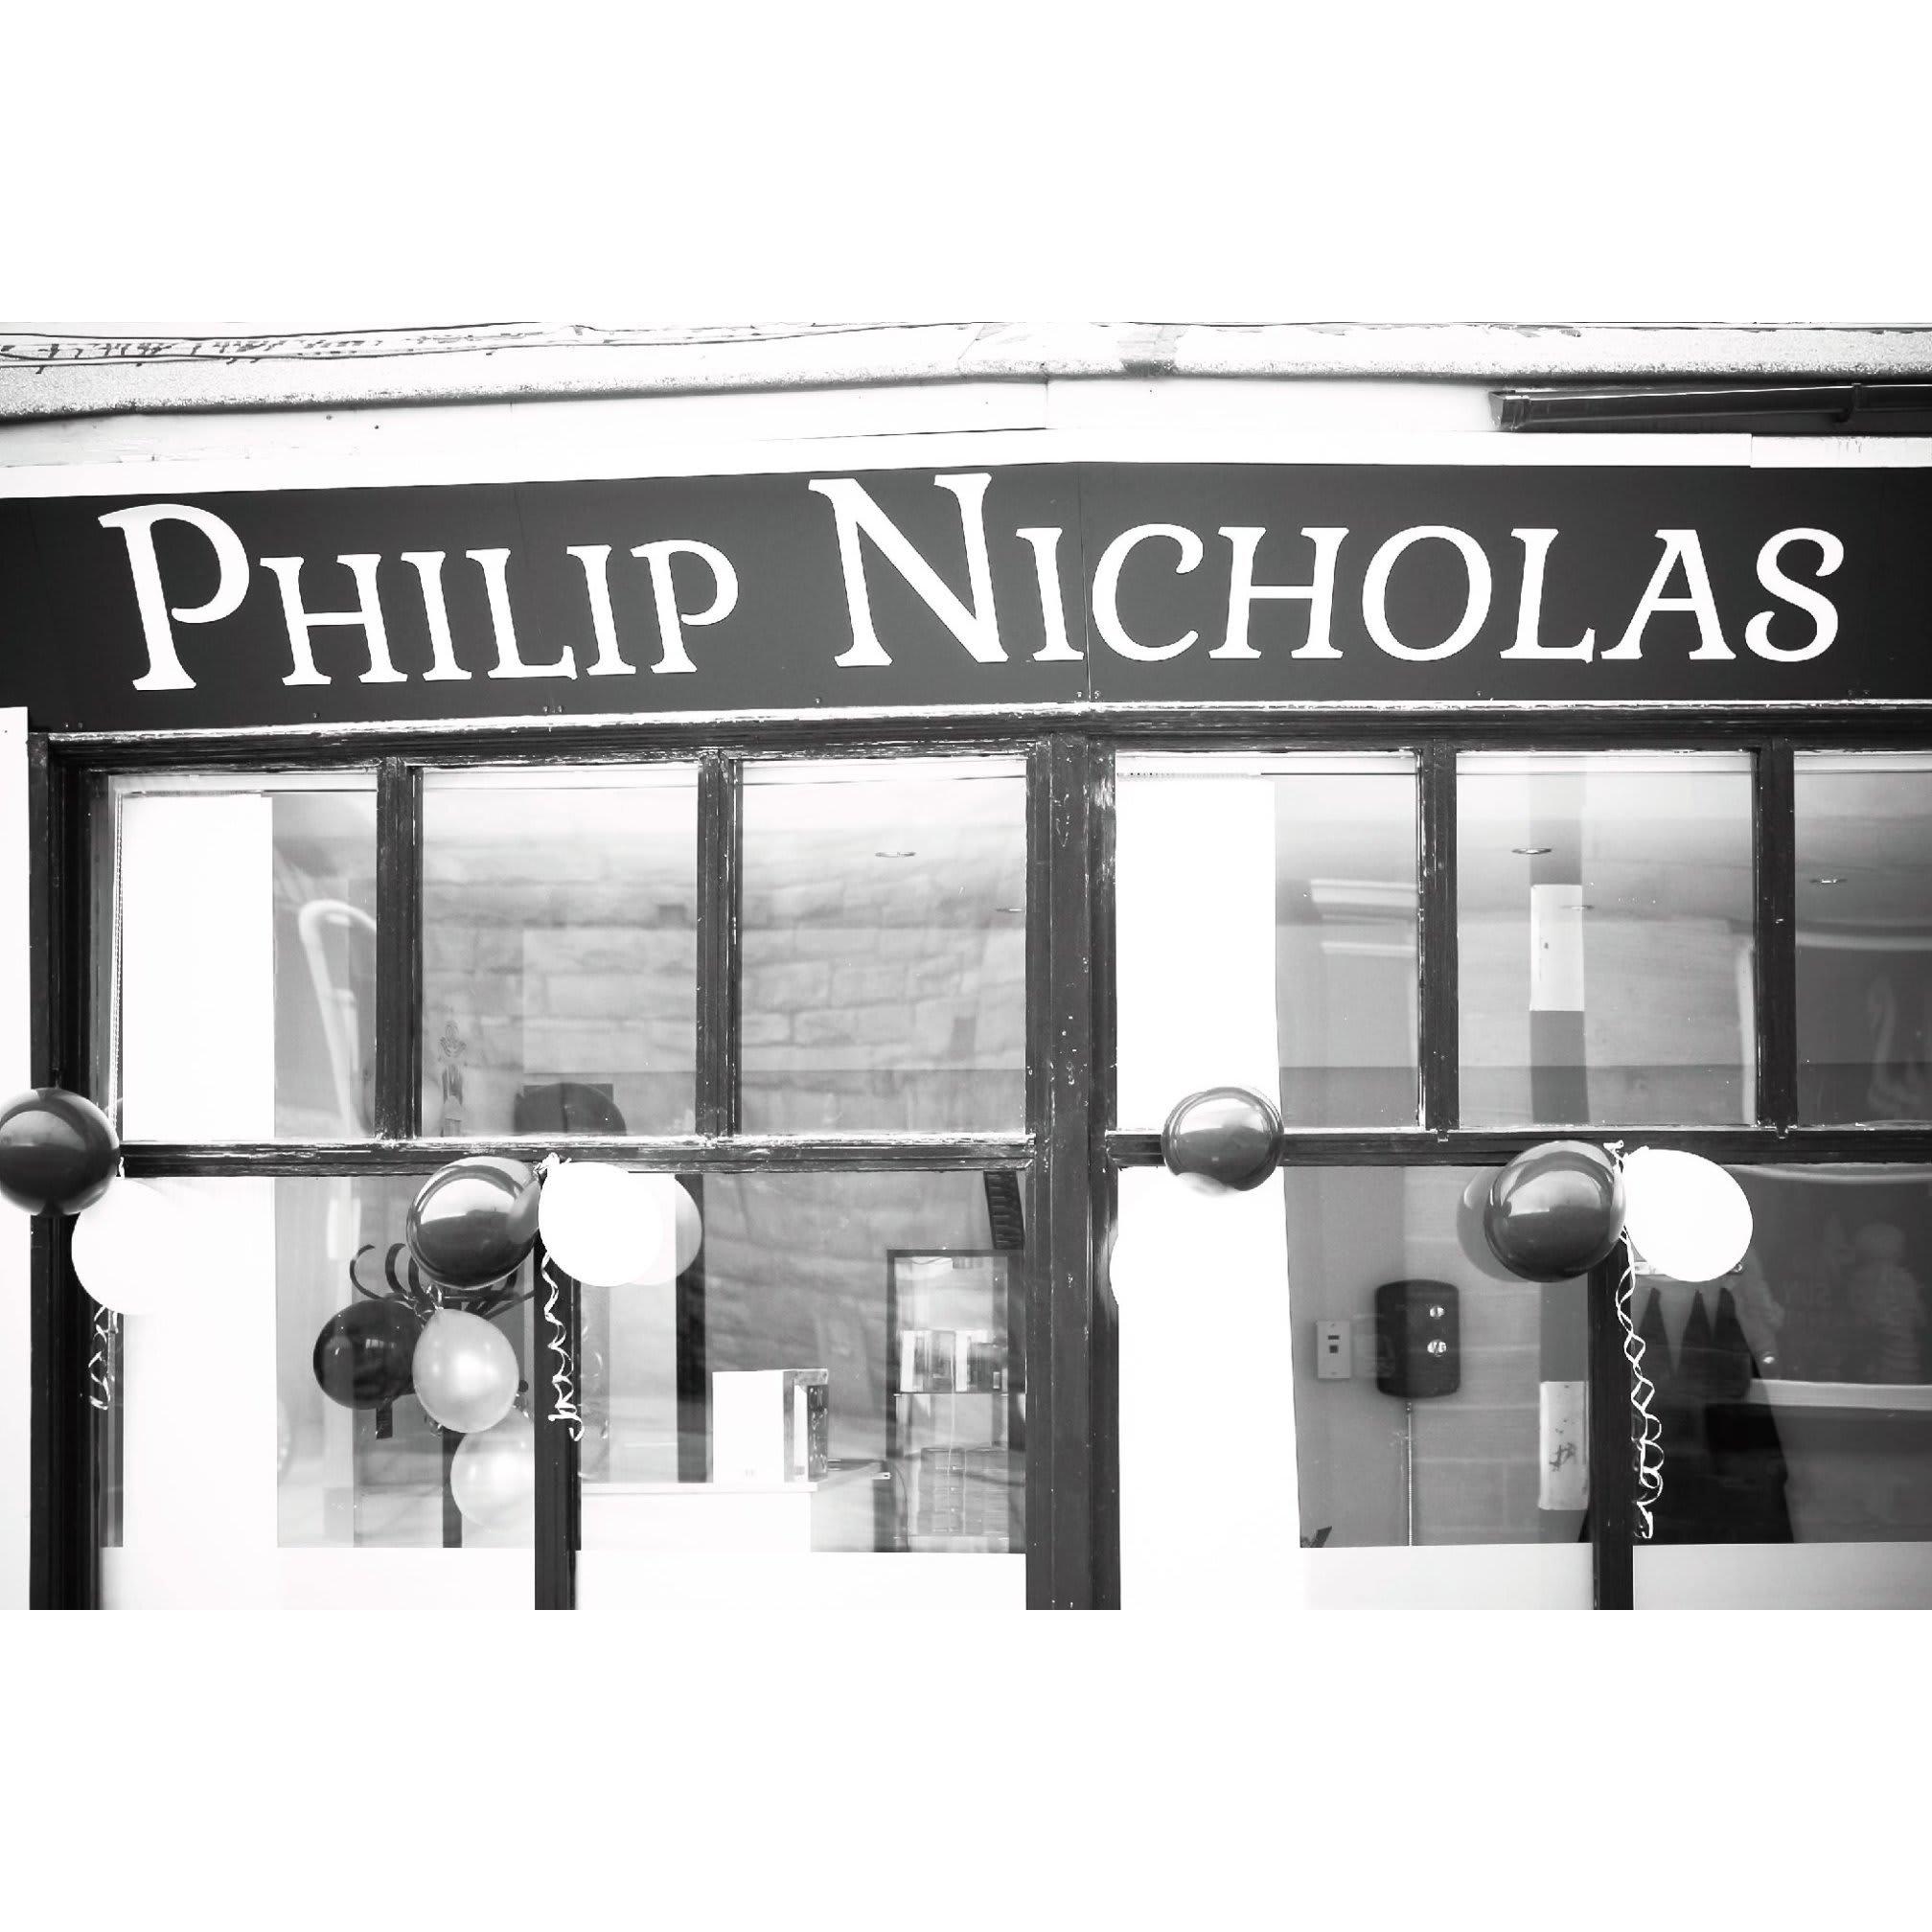 Philip Nicholas - Pudsey, West Yorkshire LS28 6DD - 01132 554147 | ShowMeLocal.com